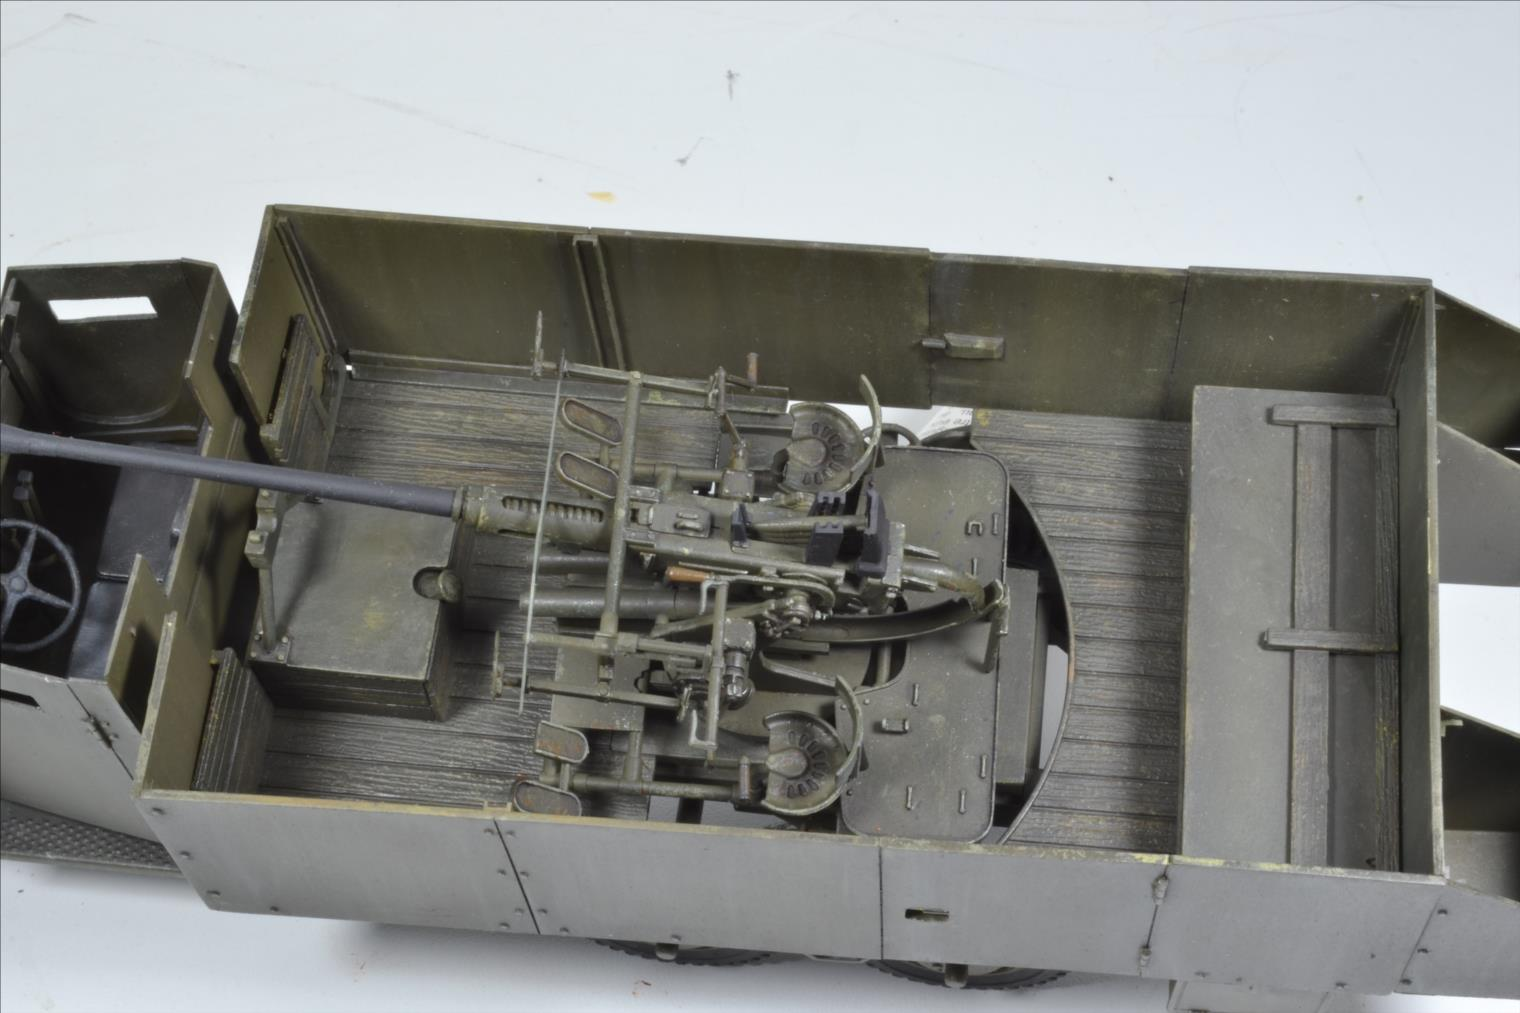 INDOCHINE GMC Bofors (Hobby Boss) 1/35 - Page 2 19122109485122494216568062